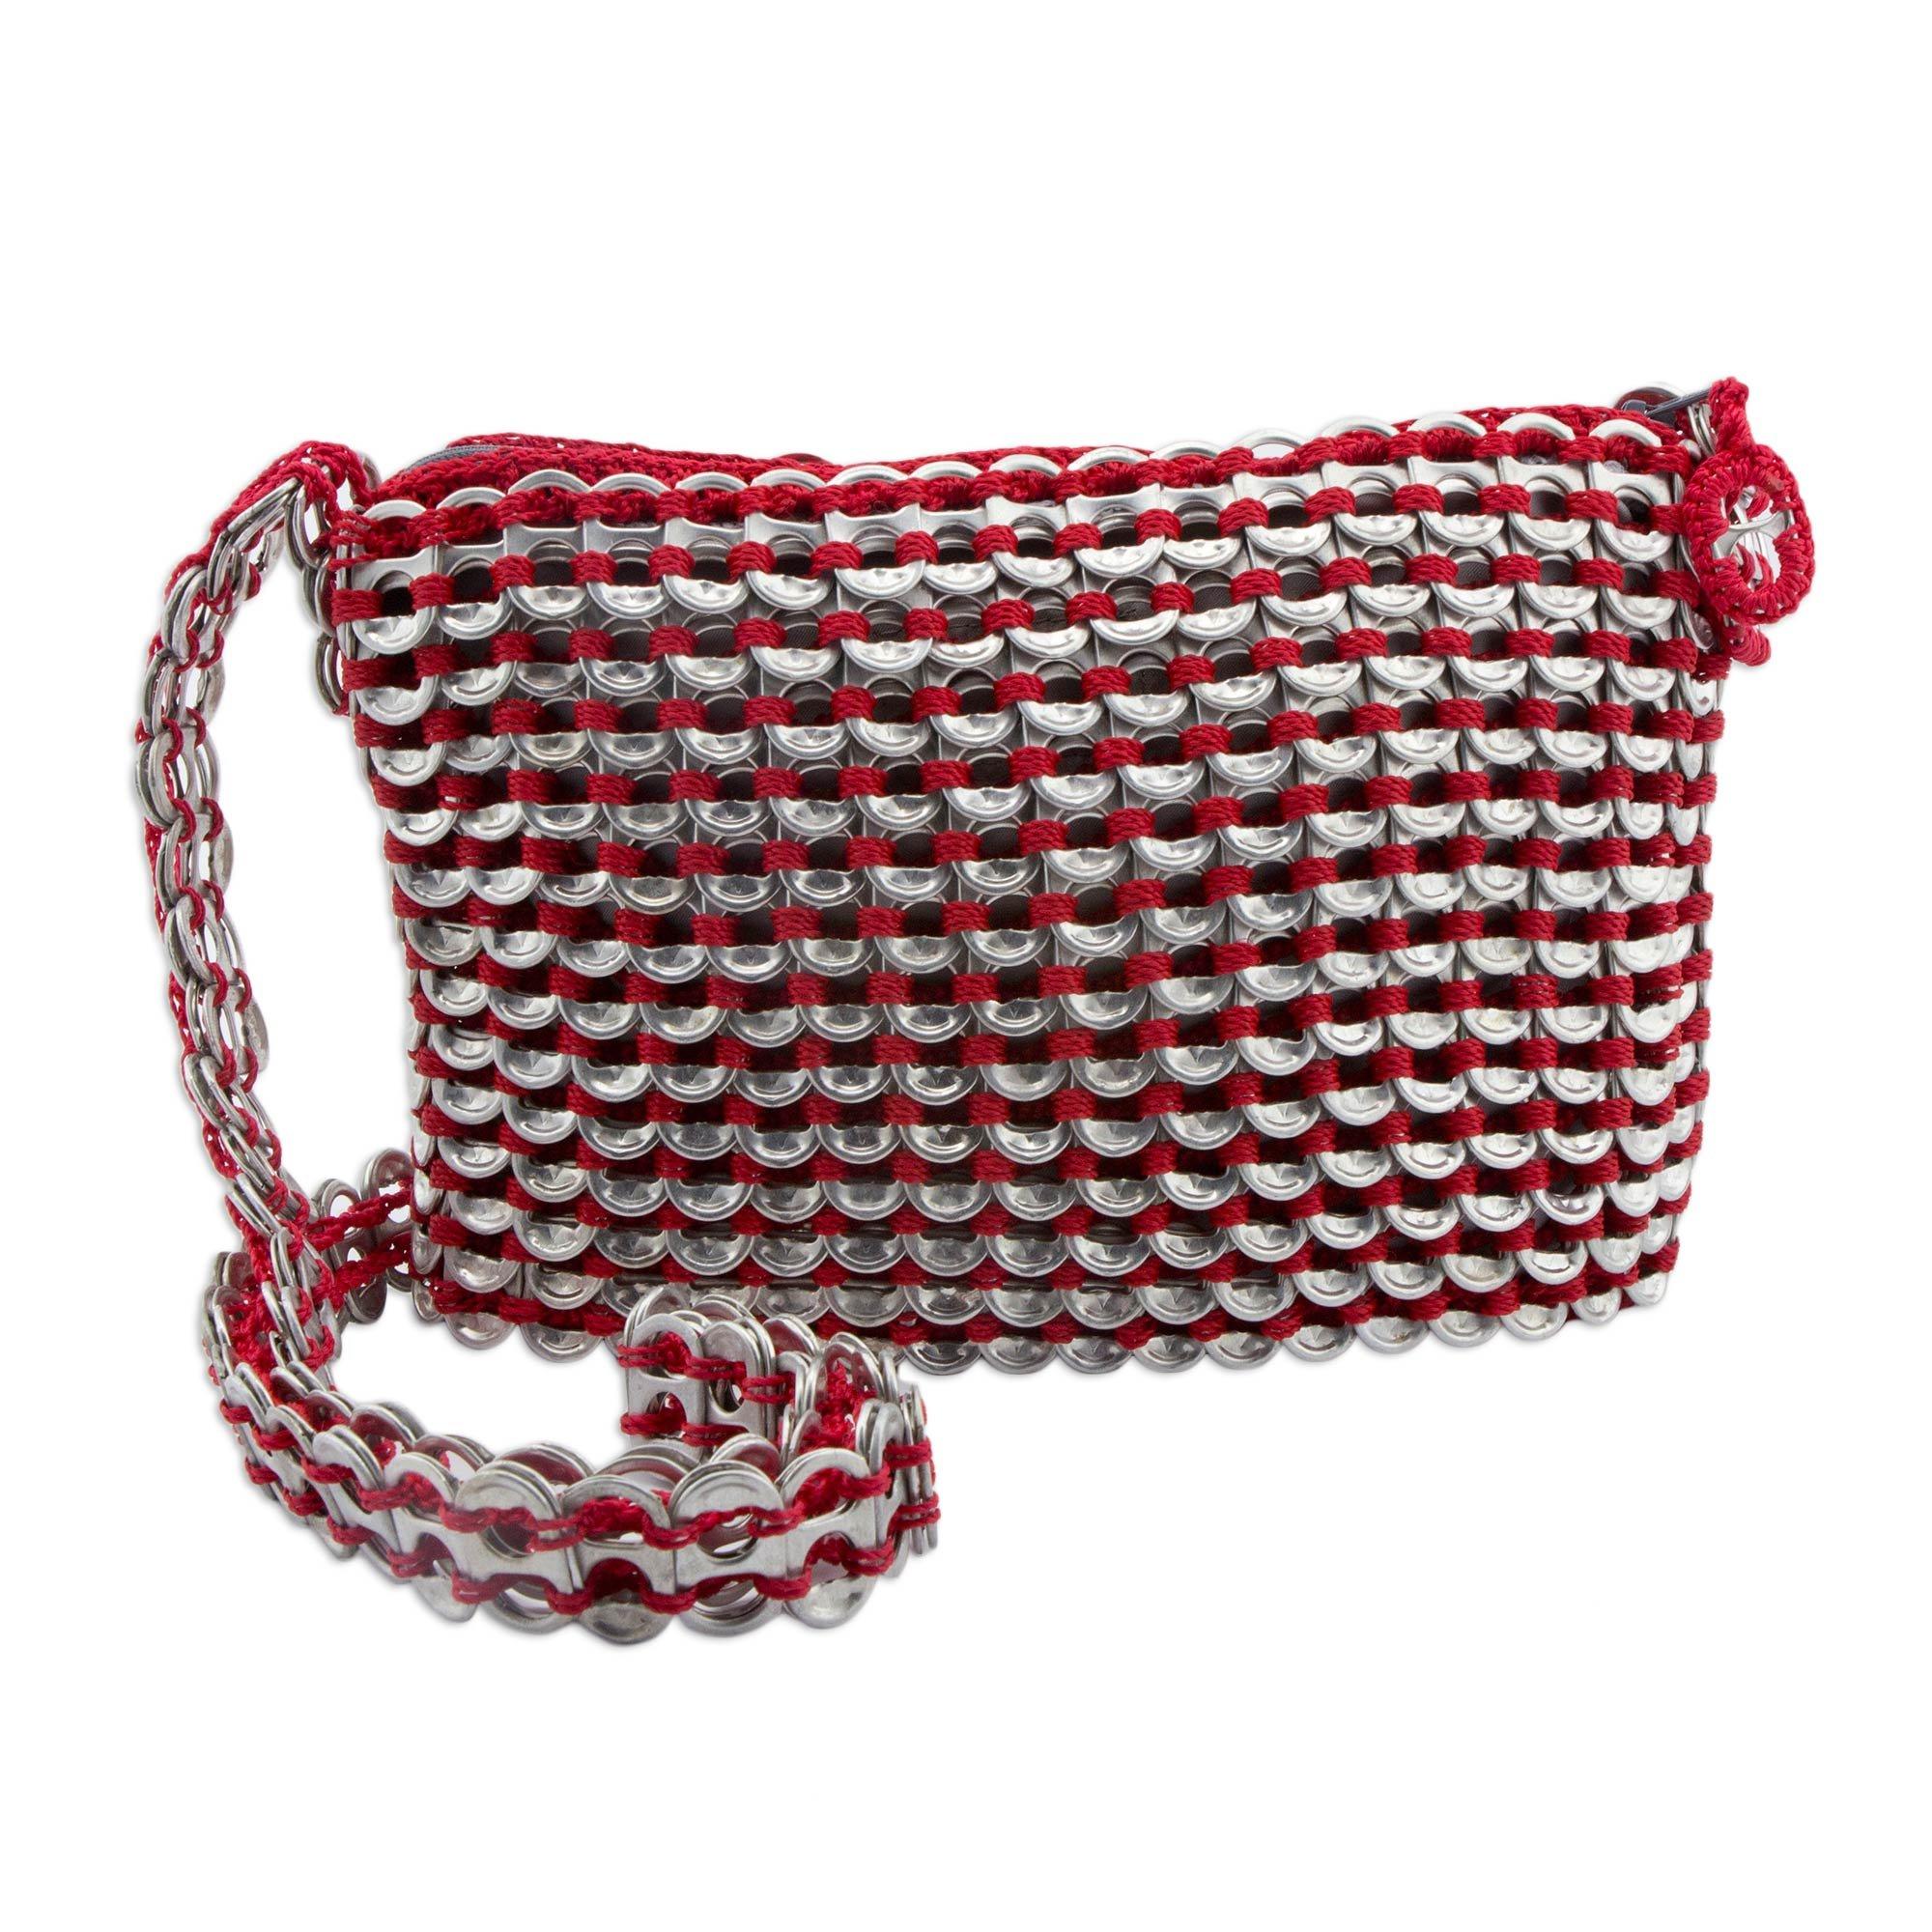 NOVICA Soda Pop-top Cosmetics Shoulder Bag, 'Chic Red'